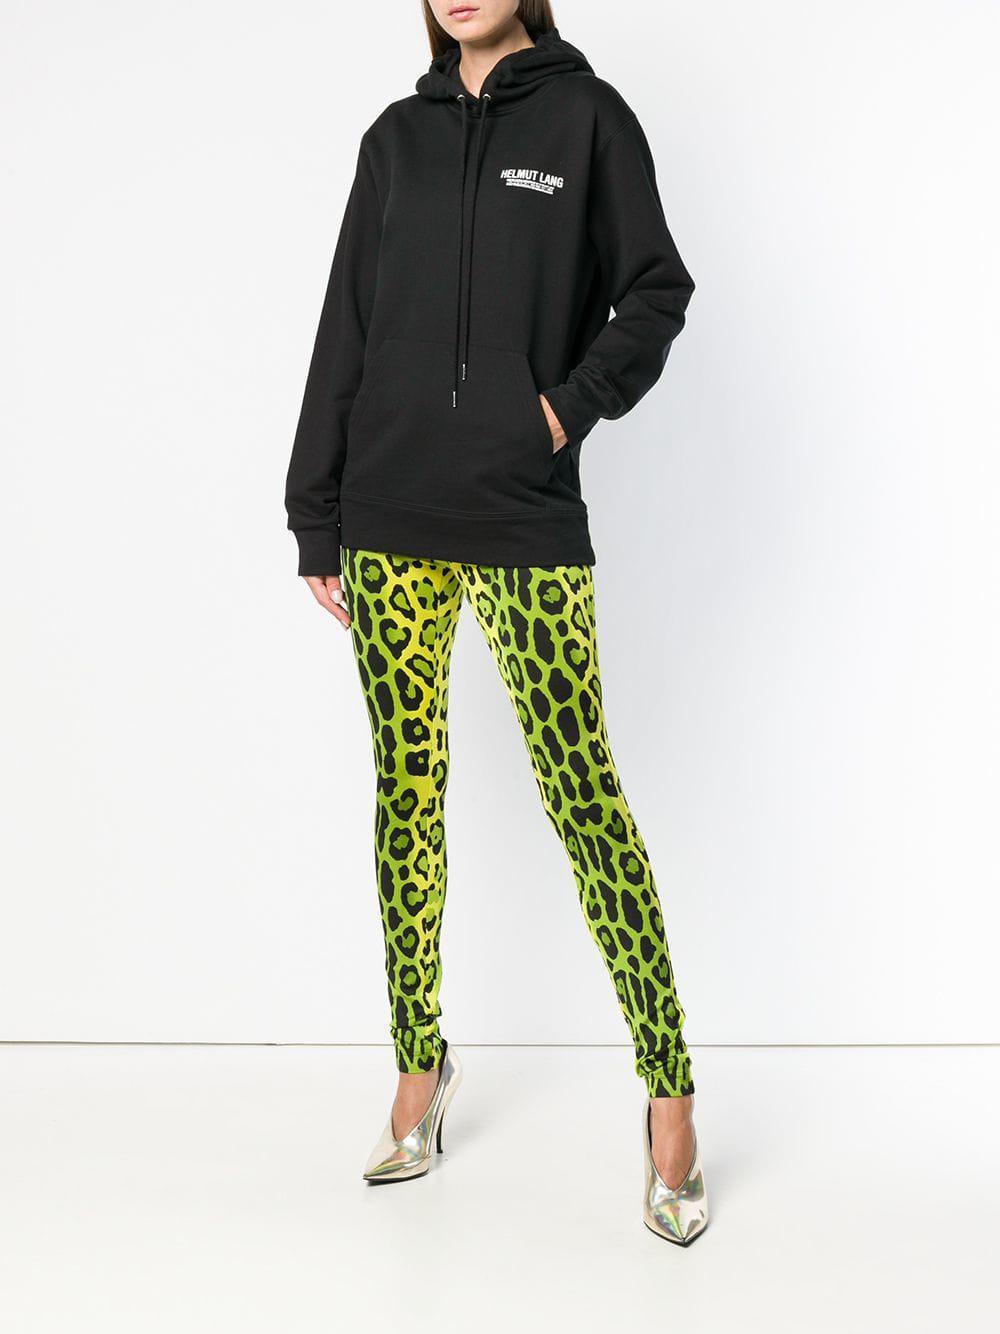 4b162dbdf570 Tom Ford Leopard Print Skinny Trousers in Green - Lyst